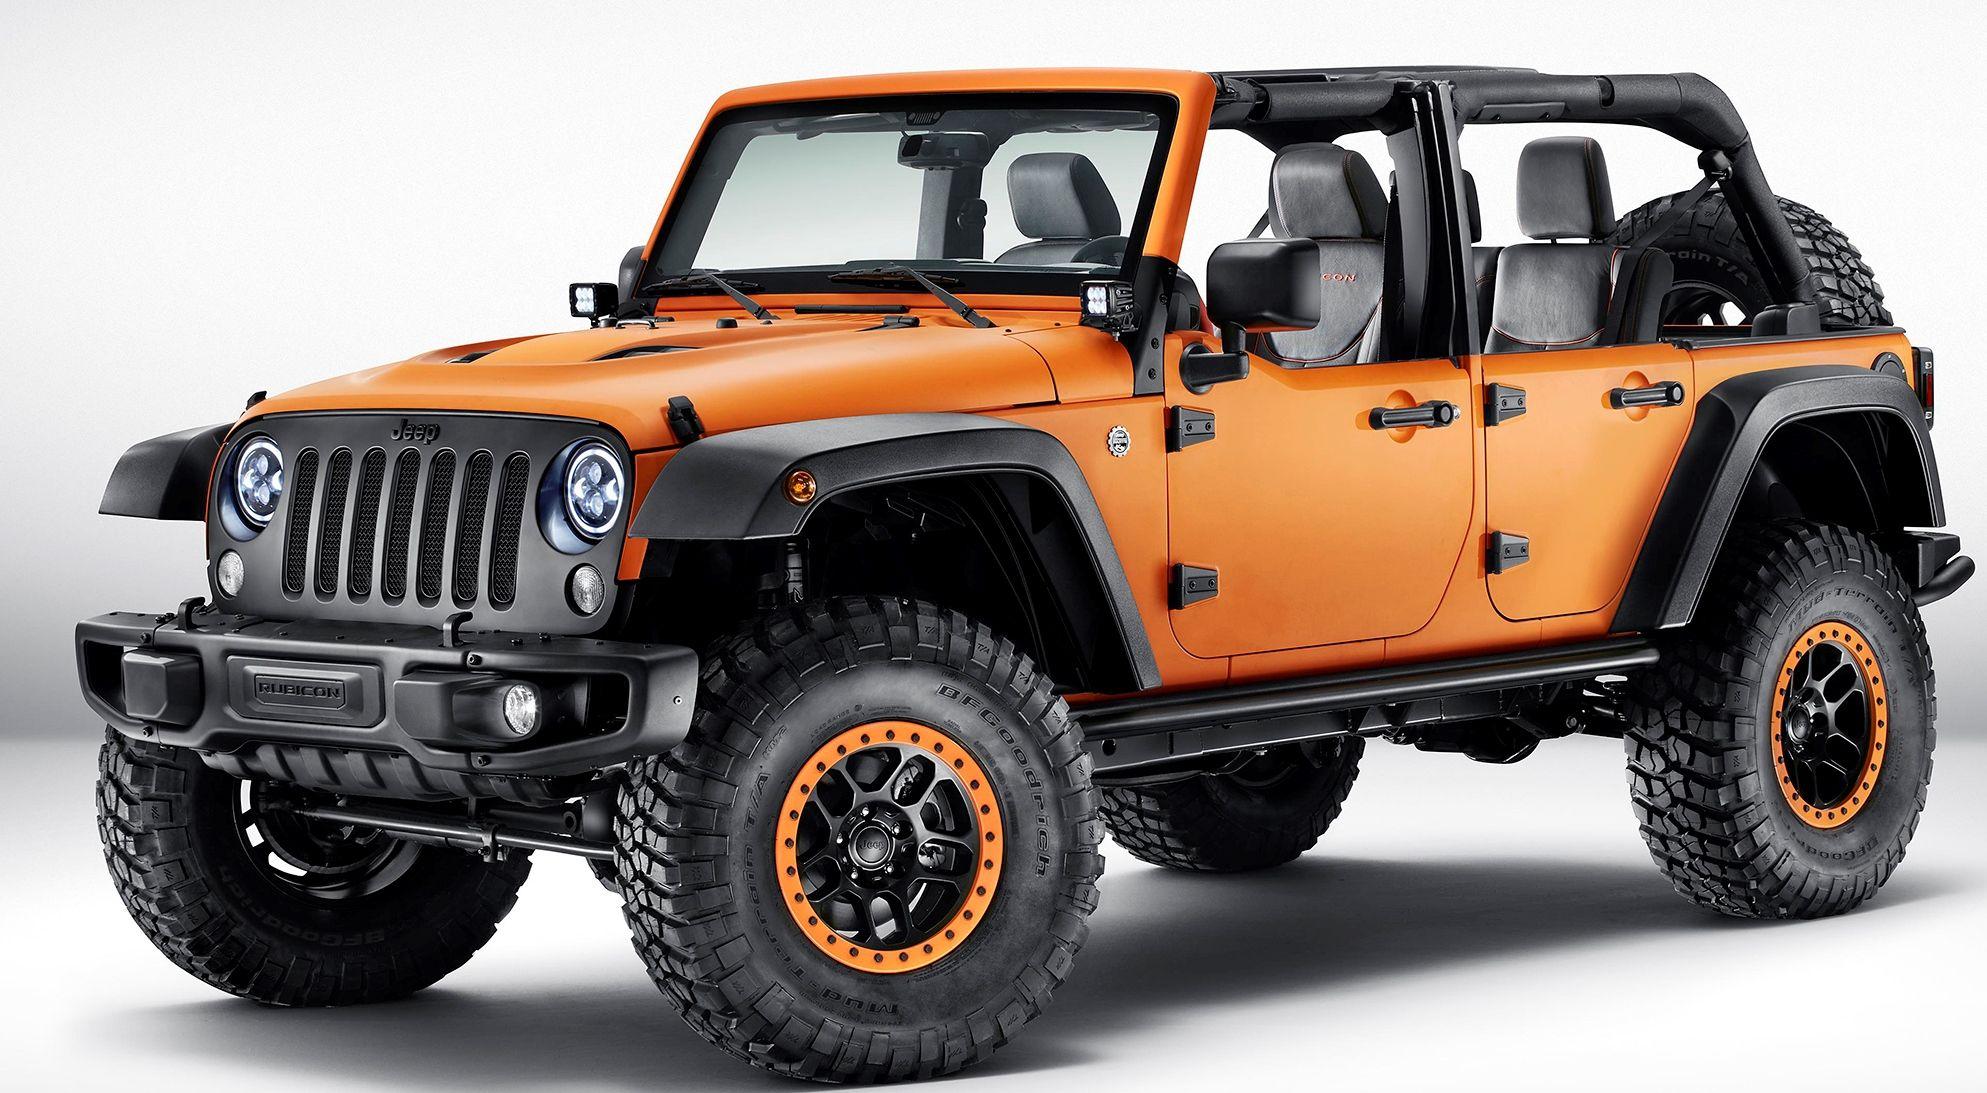 The Jeep Wrangler Rubicon Sunriser Mopar Conceptvehicle Some